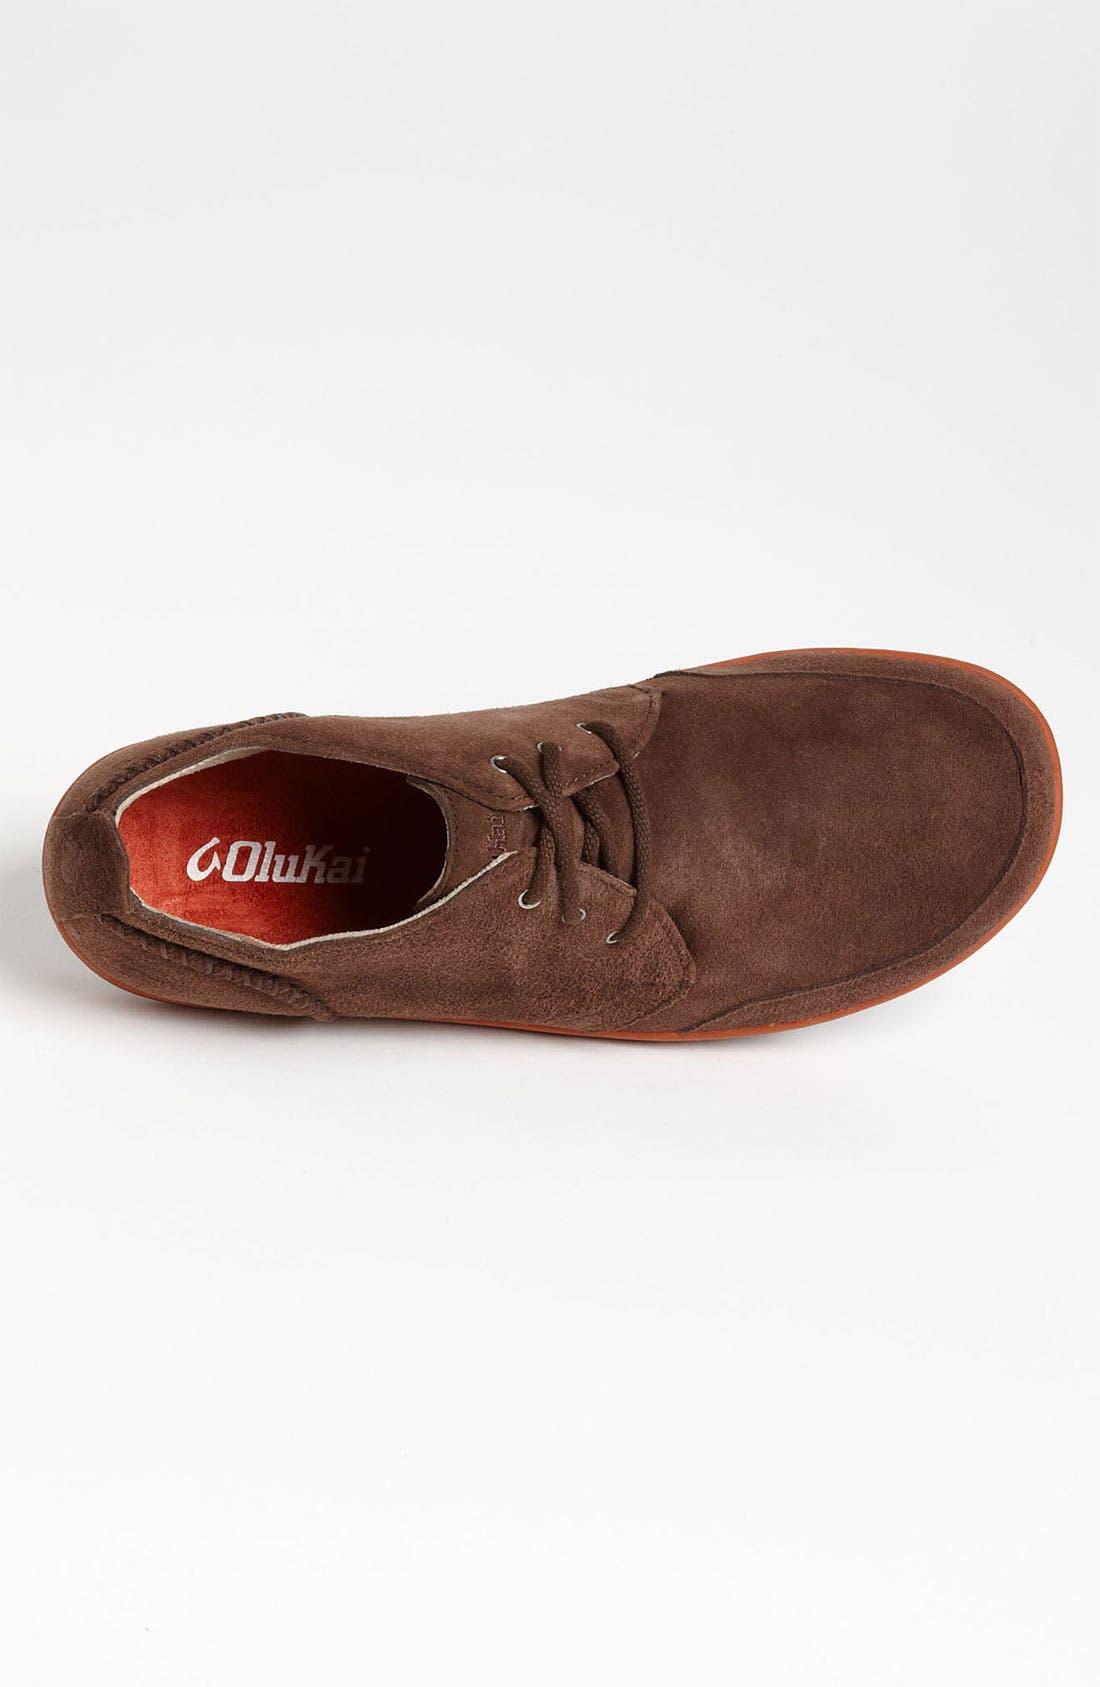 Alternate Image 3  - OluKai 'Maki' Suede Sneaker